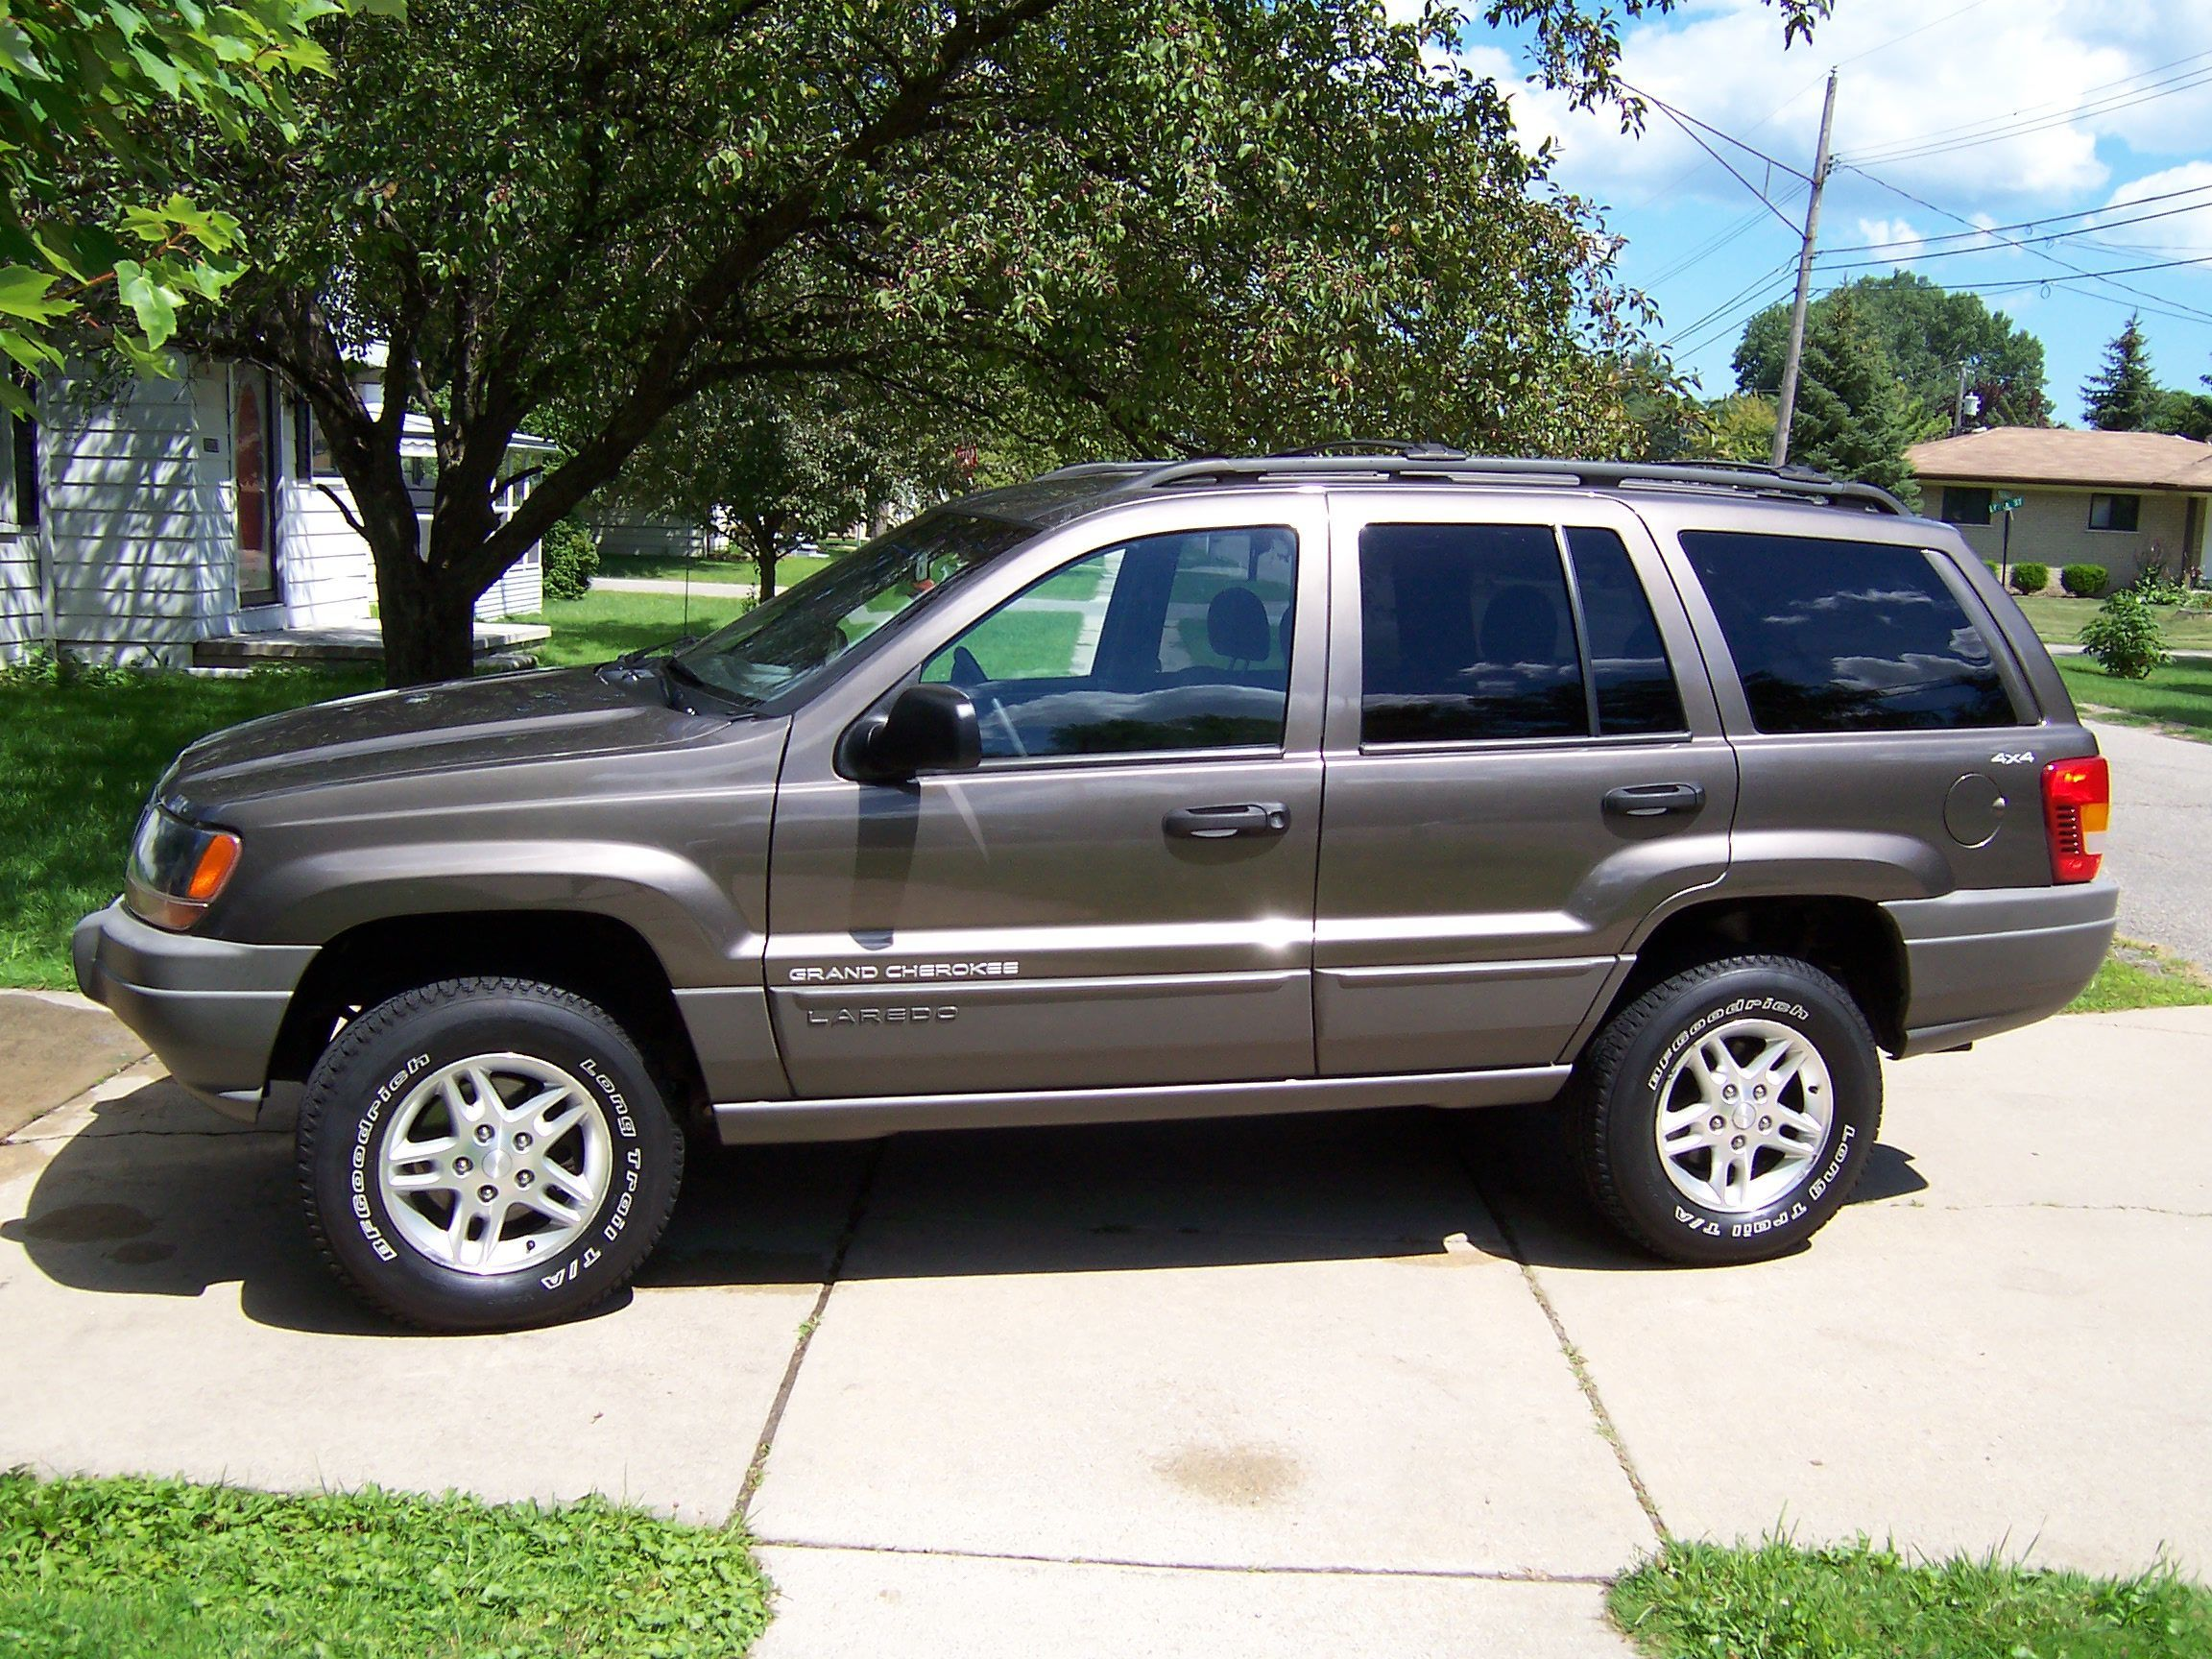 small resolution of 1999 jeep grand cherokee wj w dana 44 3 73 ratio hydro lok rear and dana 30 front axles